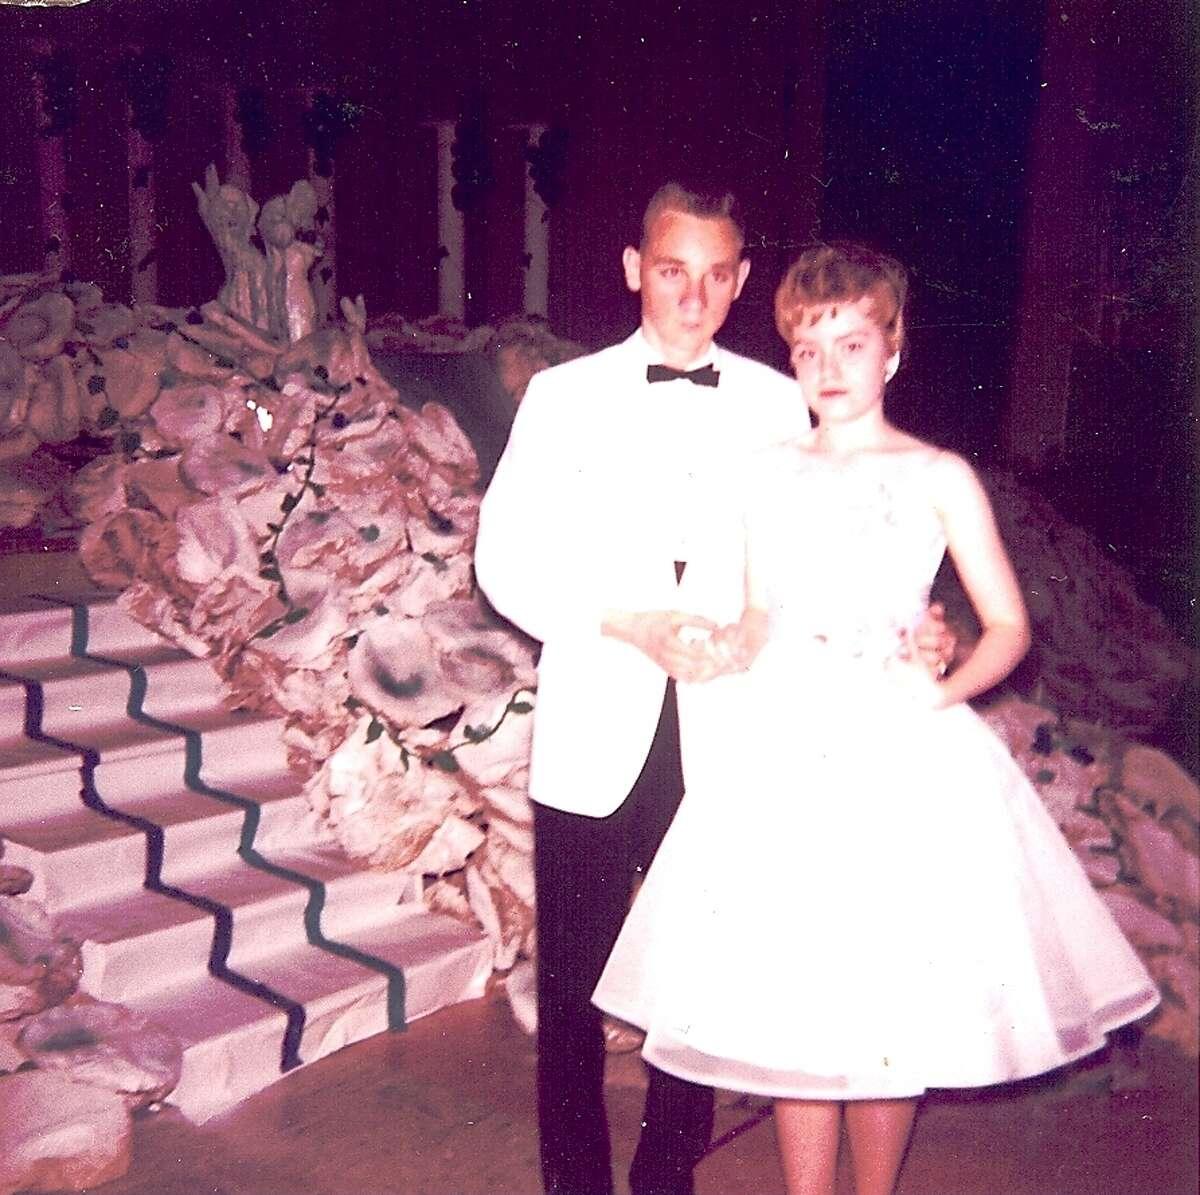 Jeanne Bright and Dennis Majeski at Thomas Jefferson High School in Council Bluff, Iowa, in 1963.